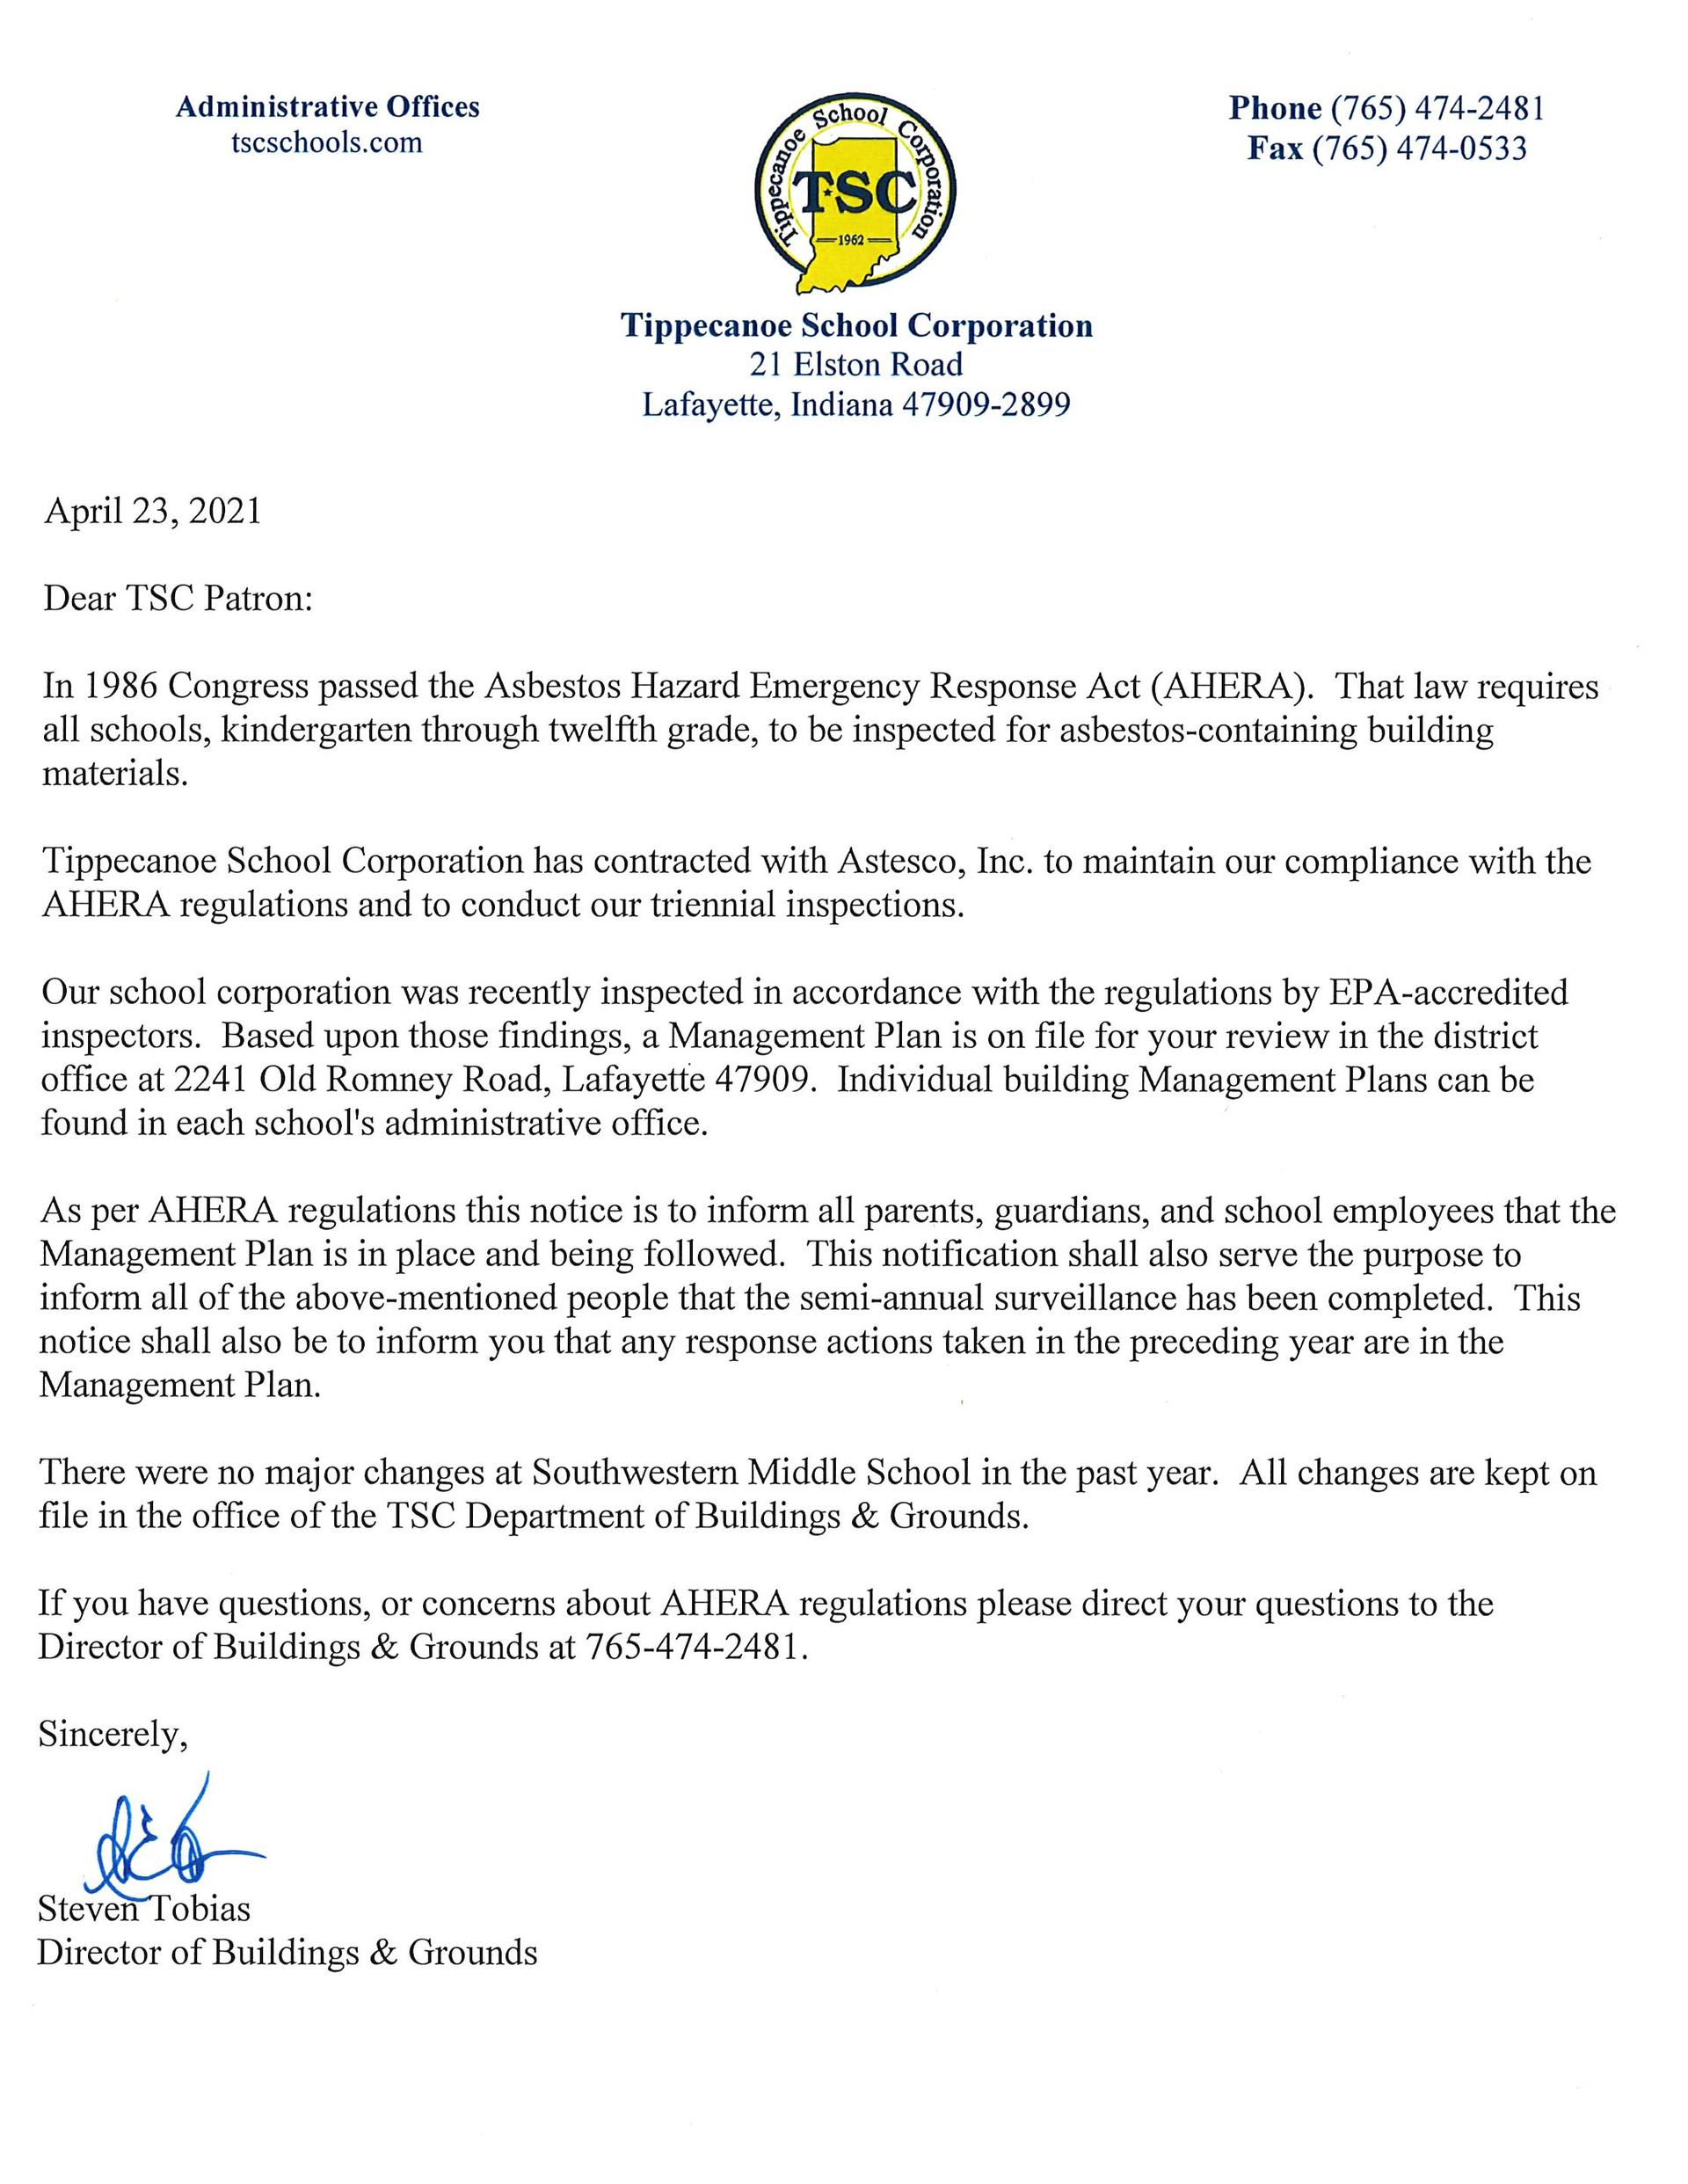 4-23-21 Asbestos Letter from Steve Tobias